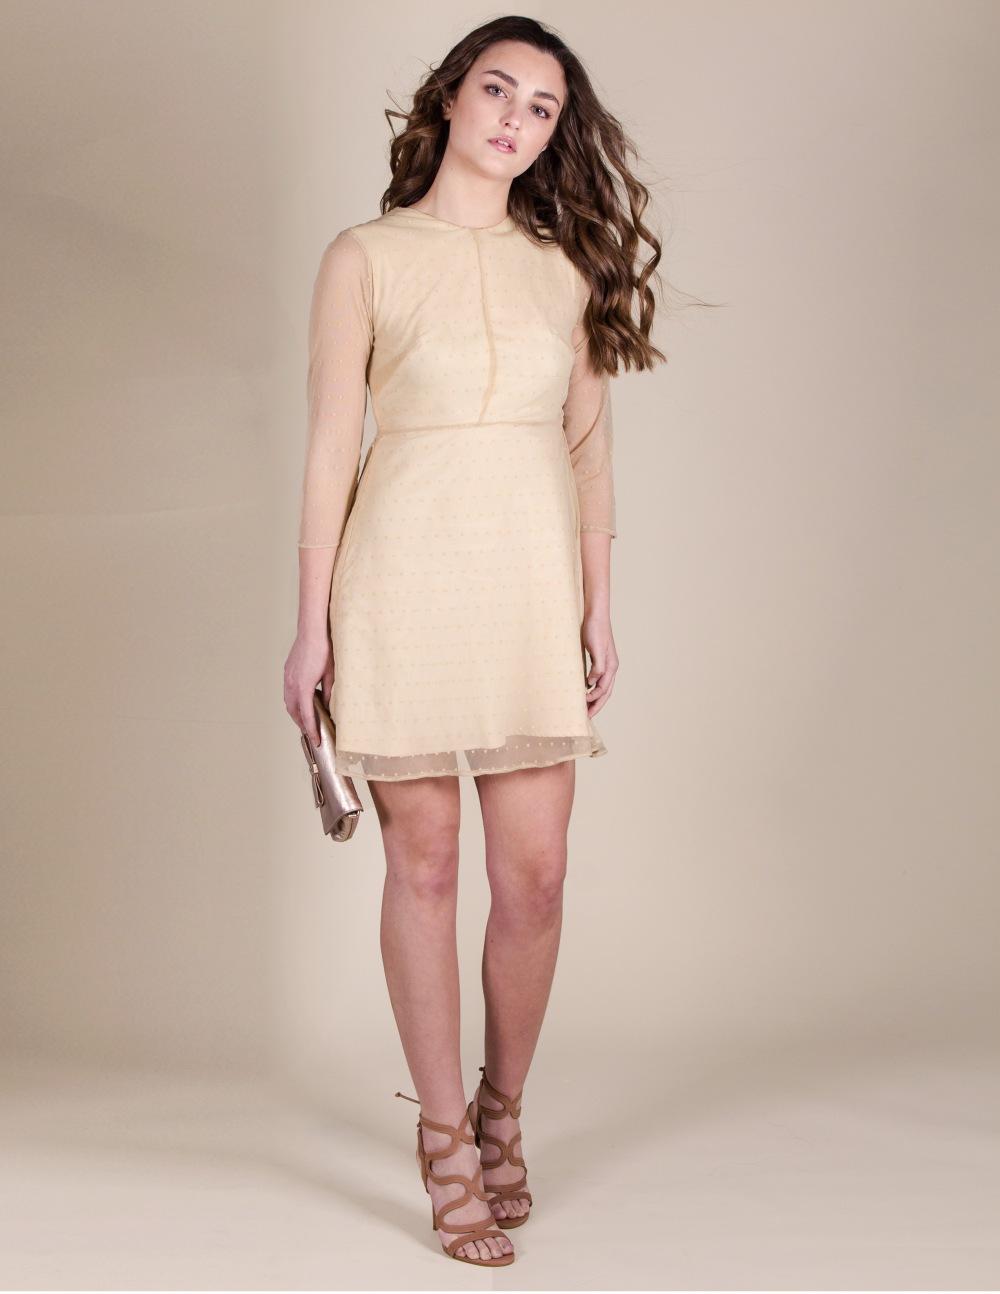 Alyssa Nicole The Molly Dress 1